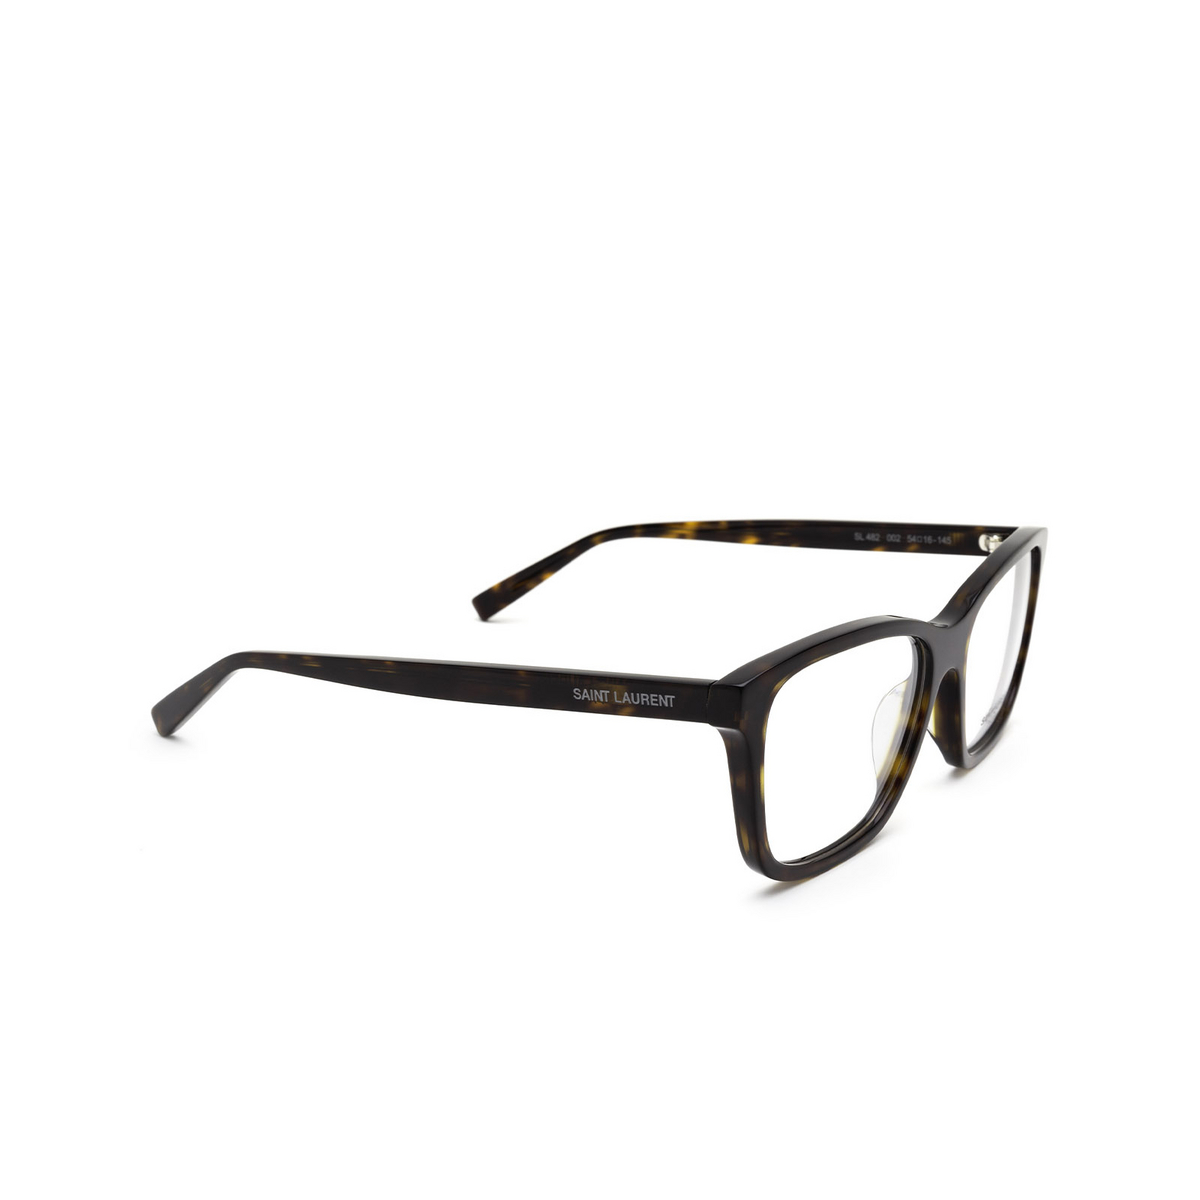 Saint Laurent® Rectangle Eyeglasses: SL 482 color Havana 002 - three-quarters view.